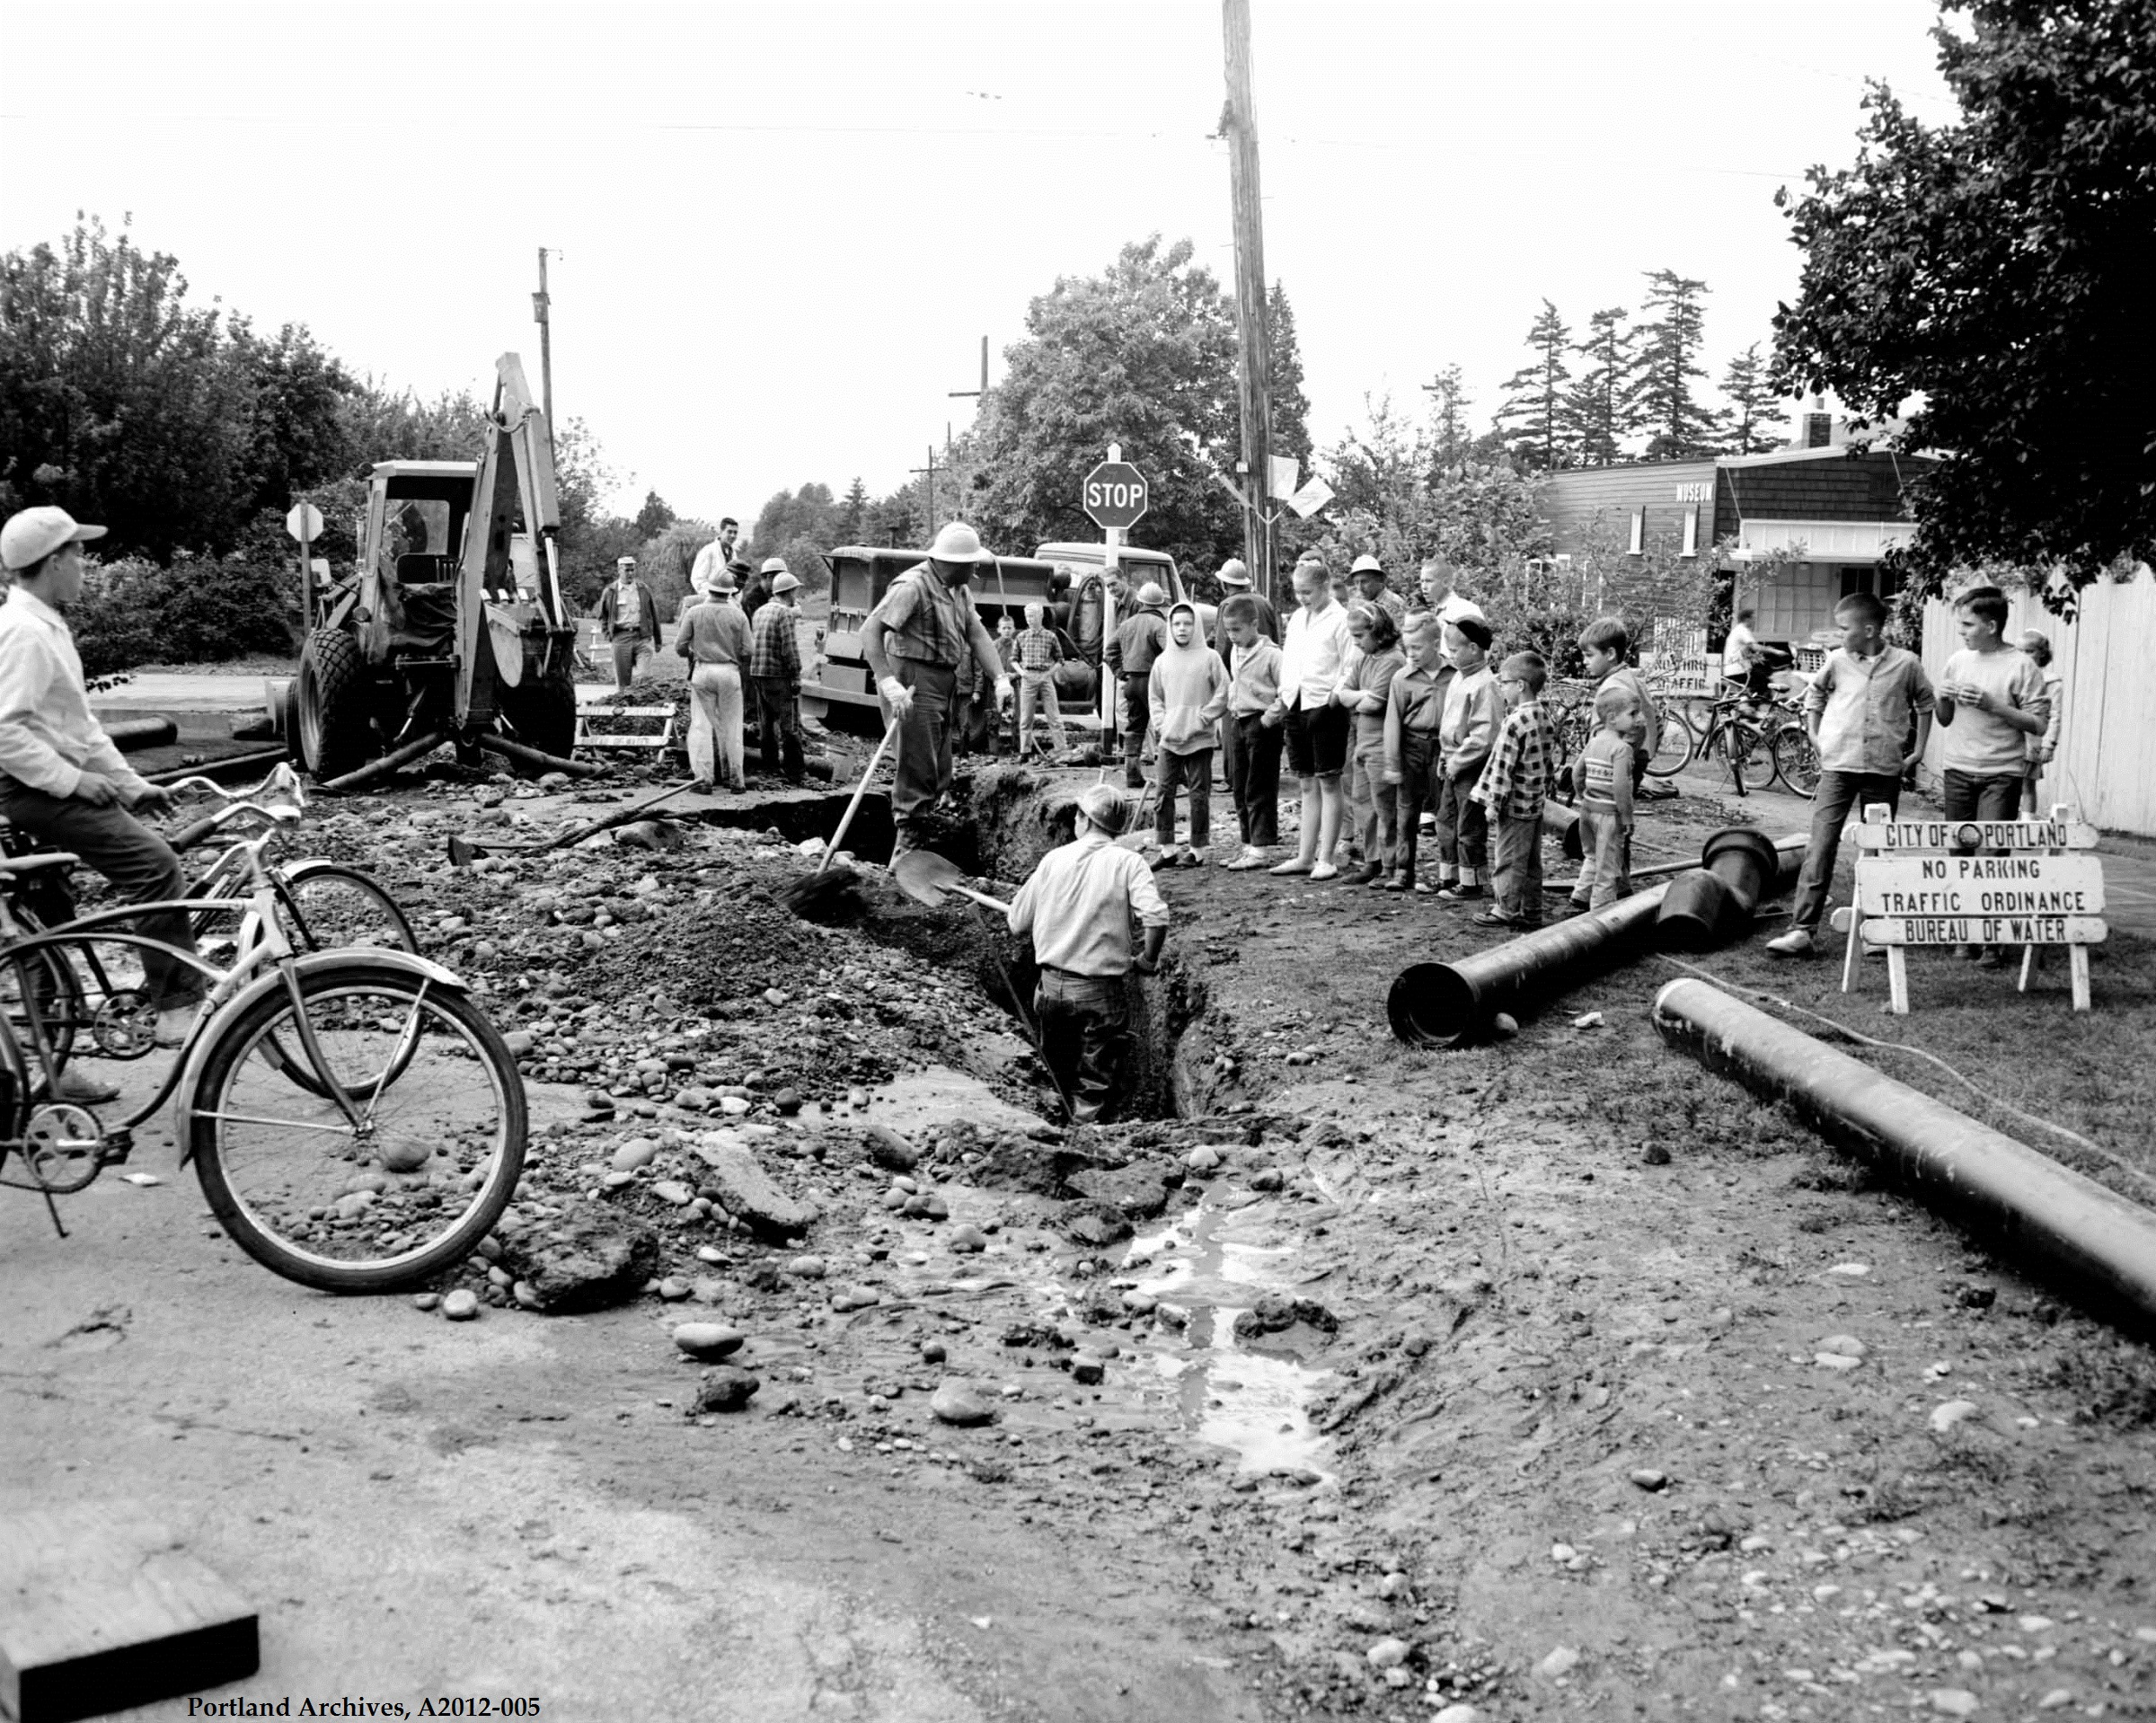 City of Portland Archives, Oregon, Main break at NE 70th Ave. and NE Prescott St., A2012-005, 1962